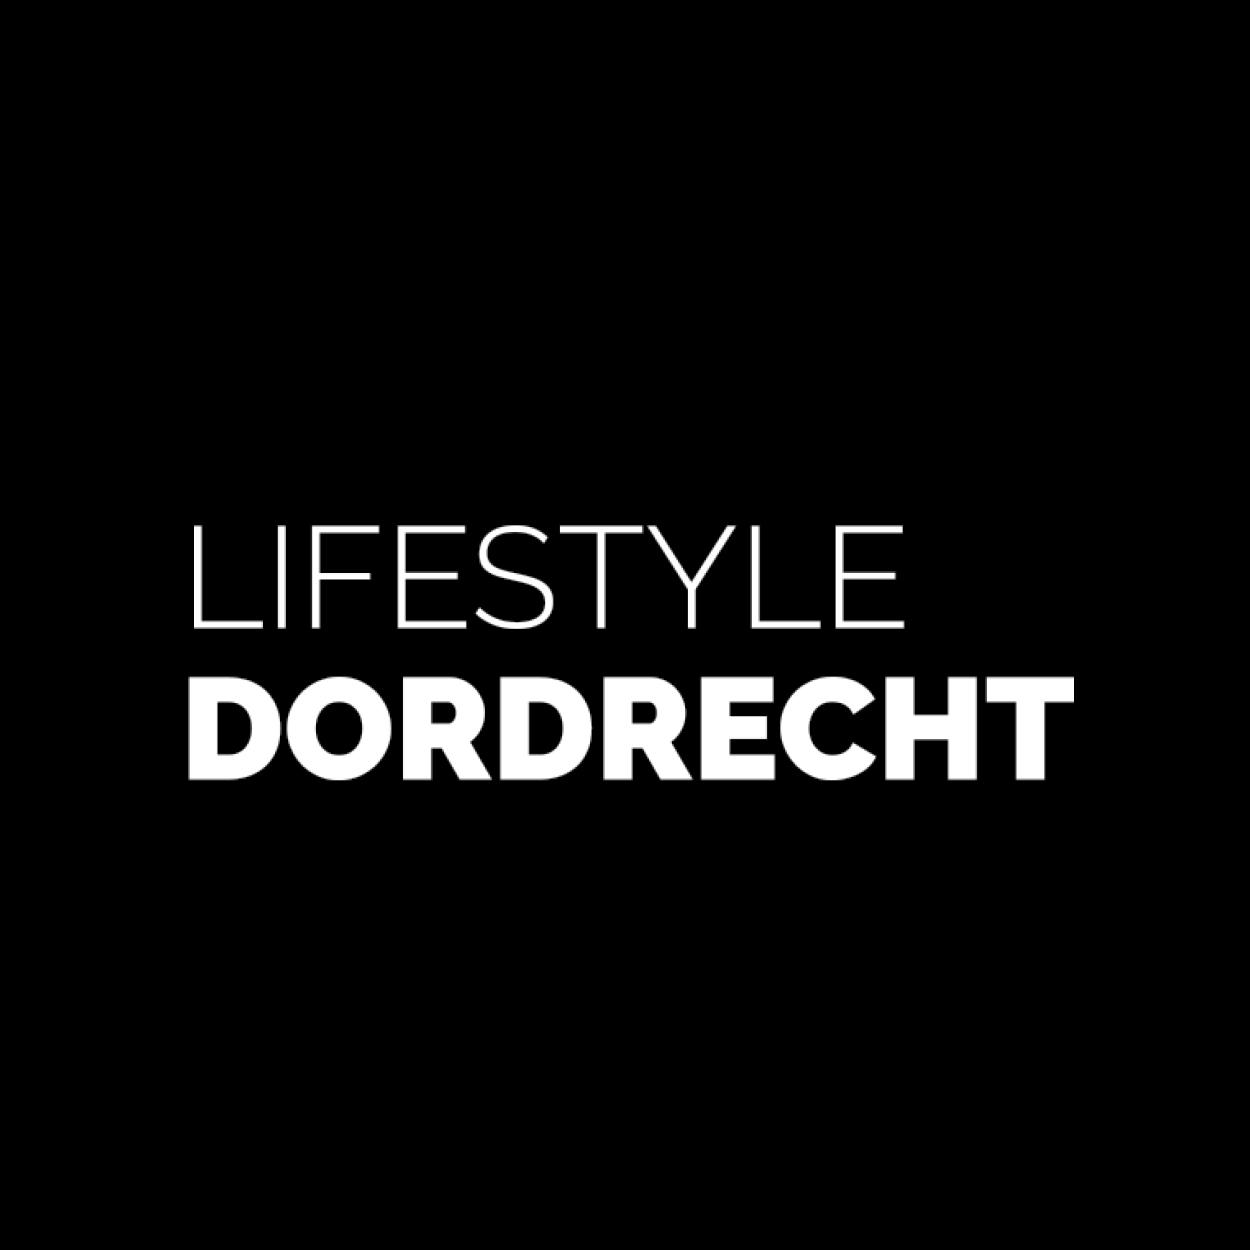 Lifestyle Dordrecht